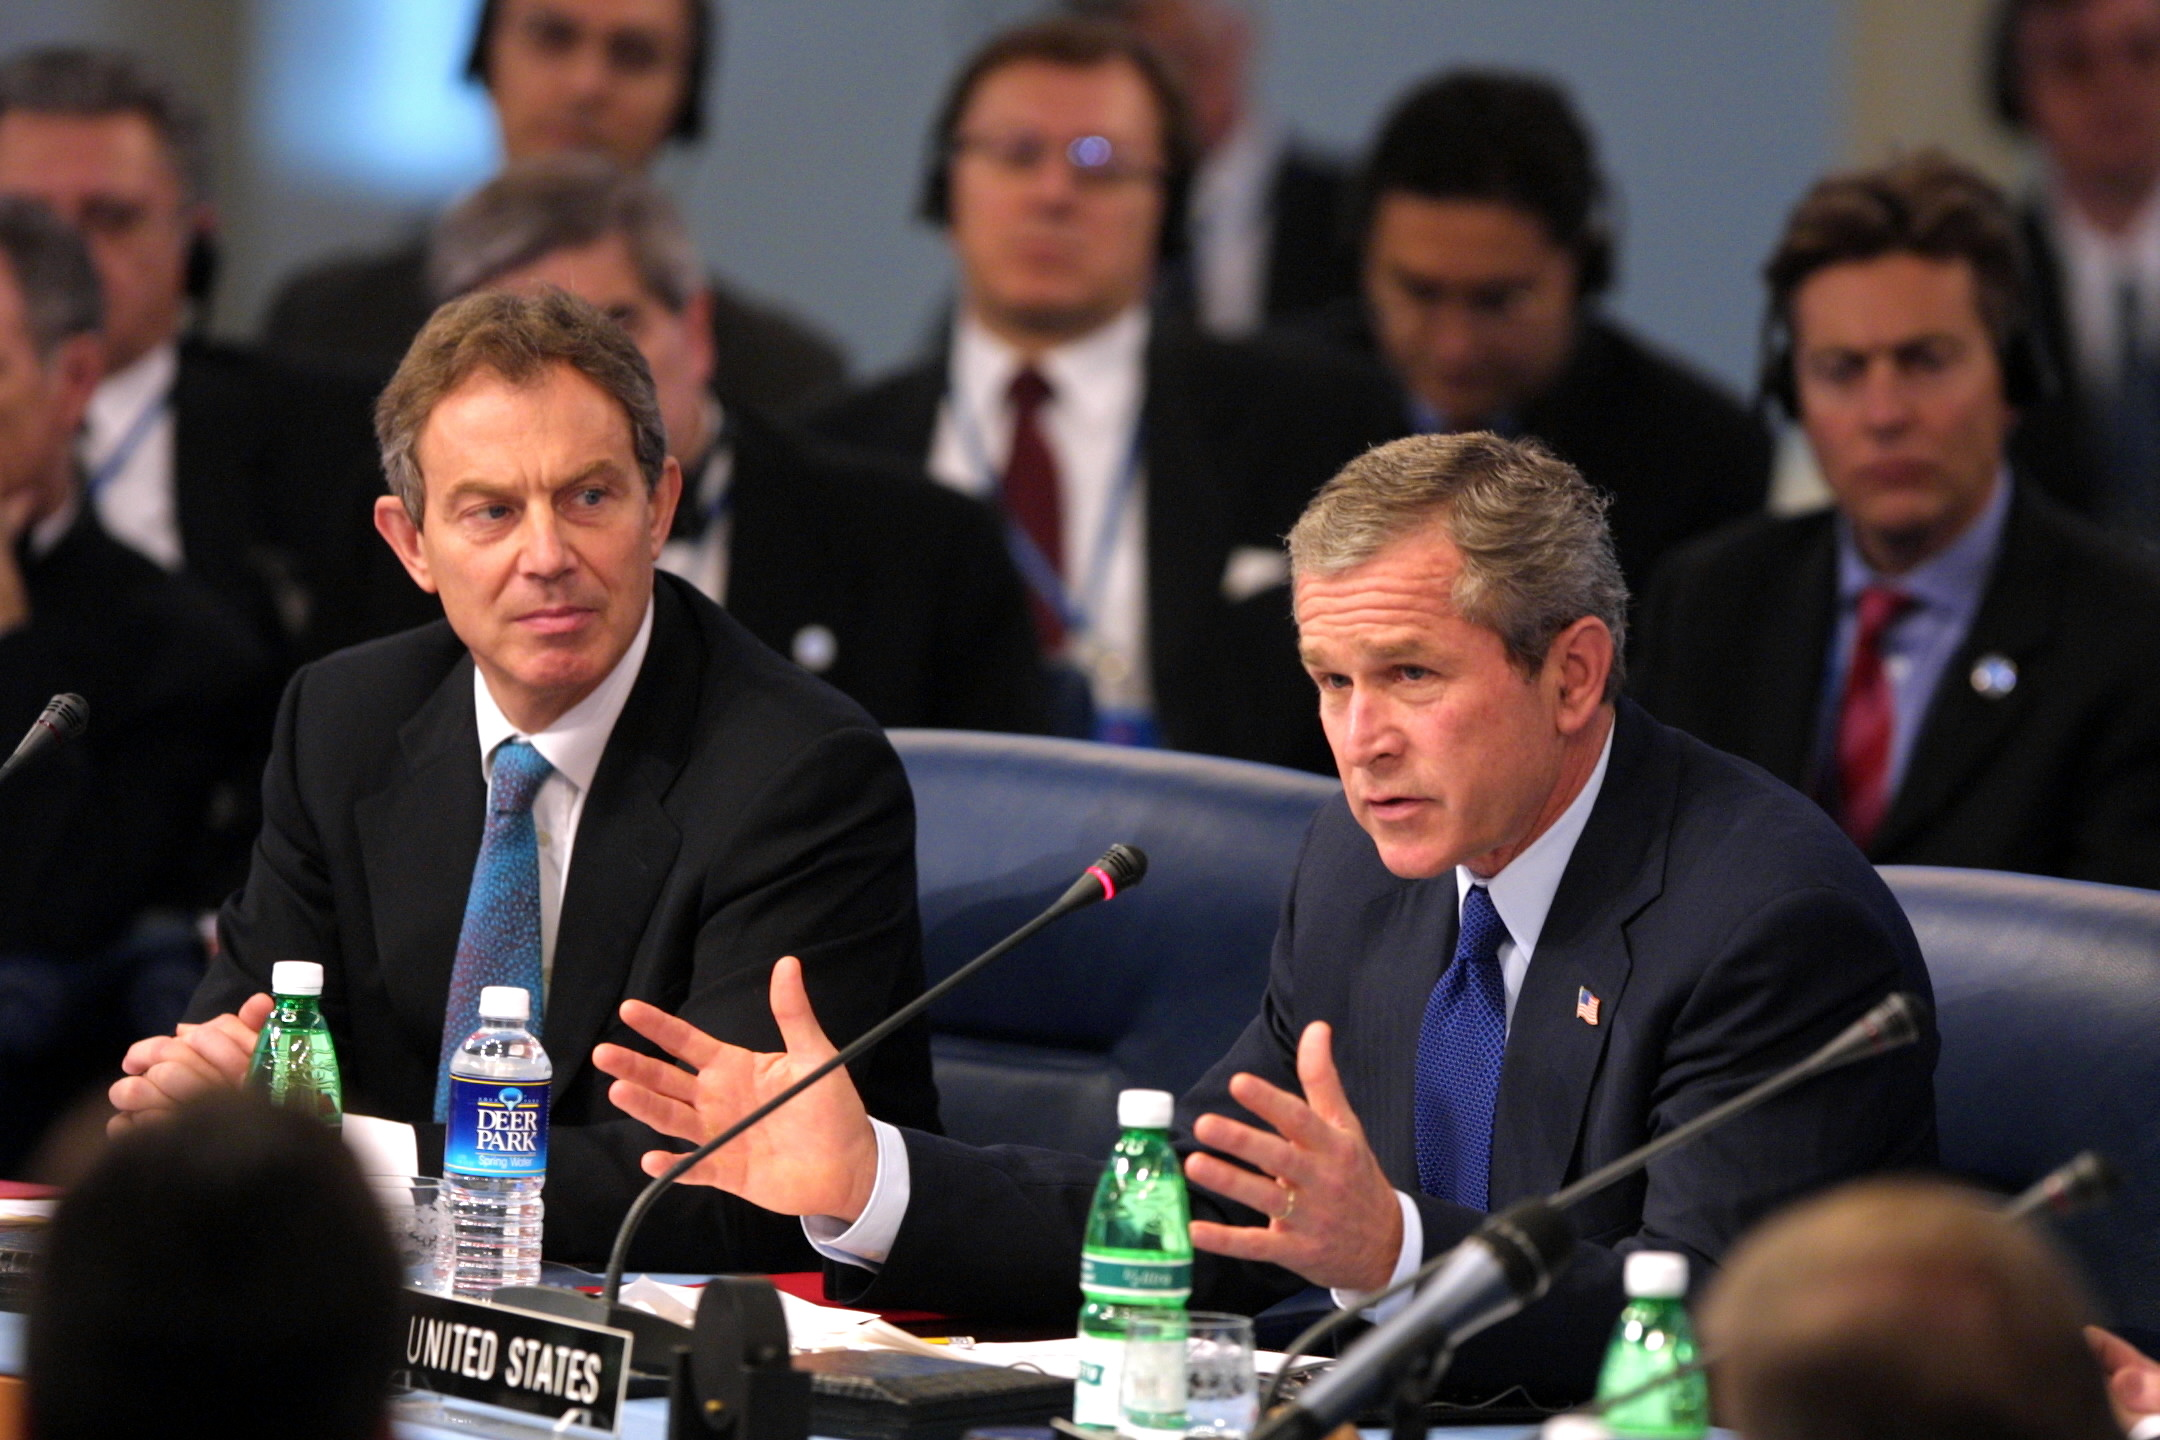 Archivo:President George W. Bush and Prime Minister Tony Blair of Great Britain at Meeting of the NATO-Russia Council.jpg - Wikipedia, la enciclopedia libre